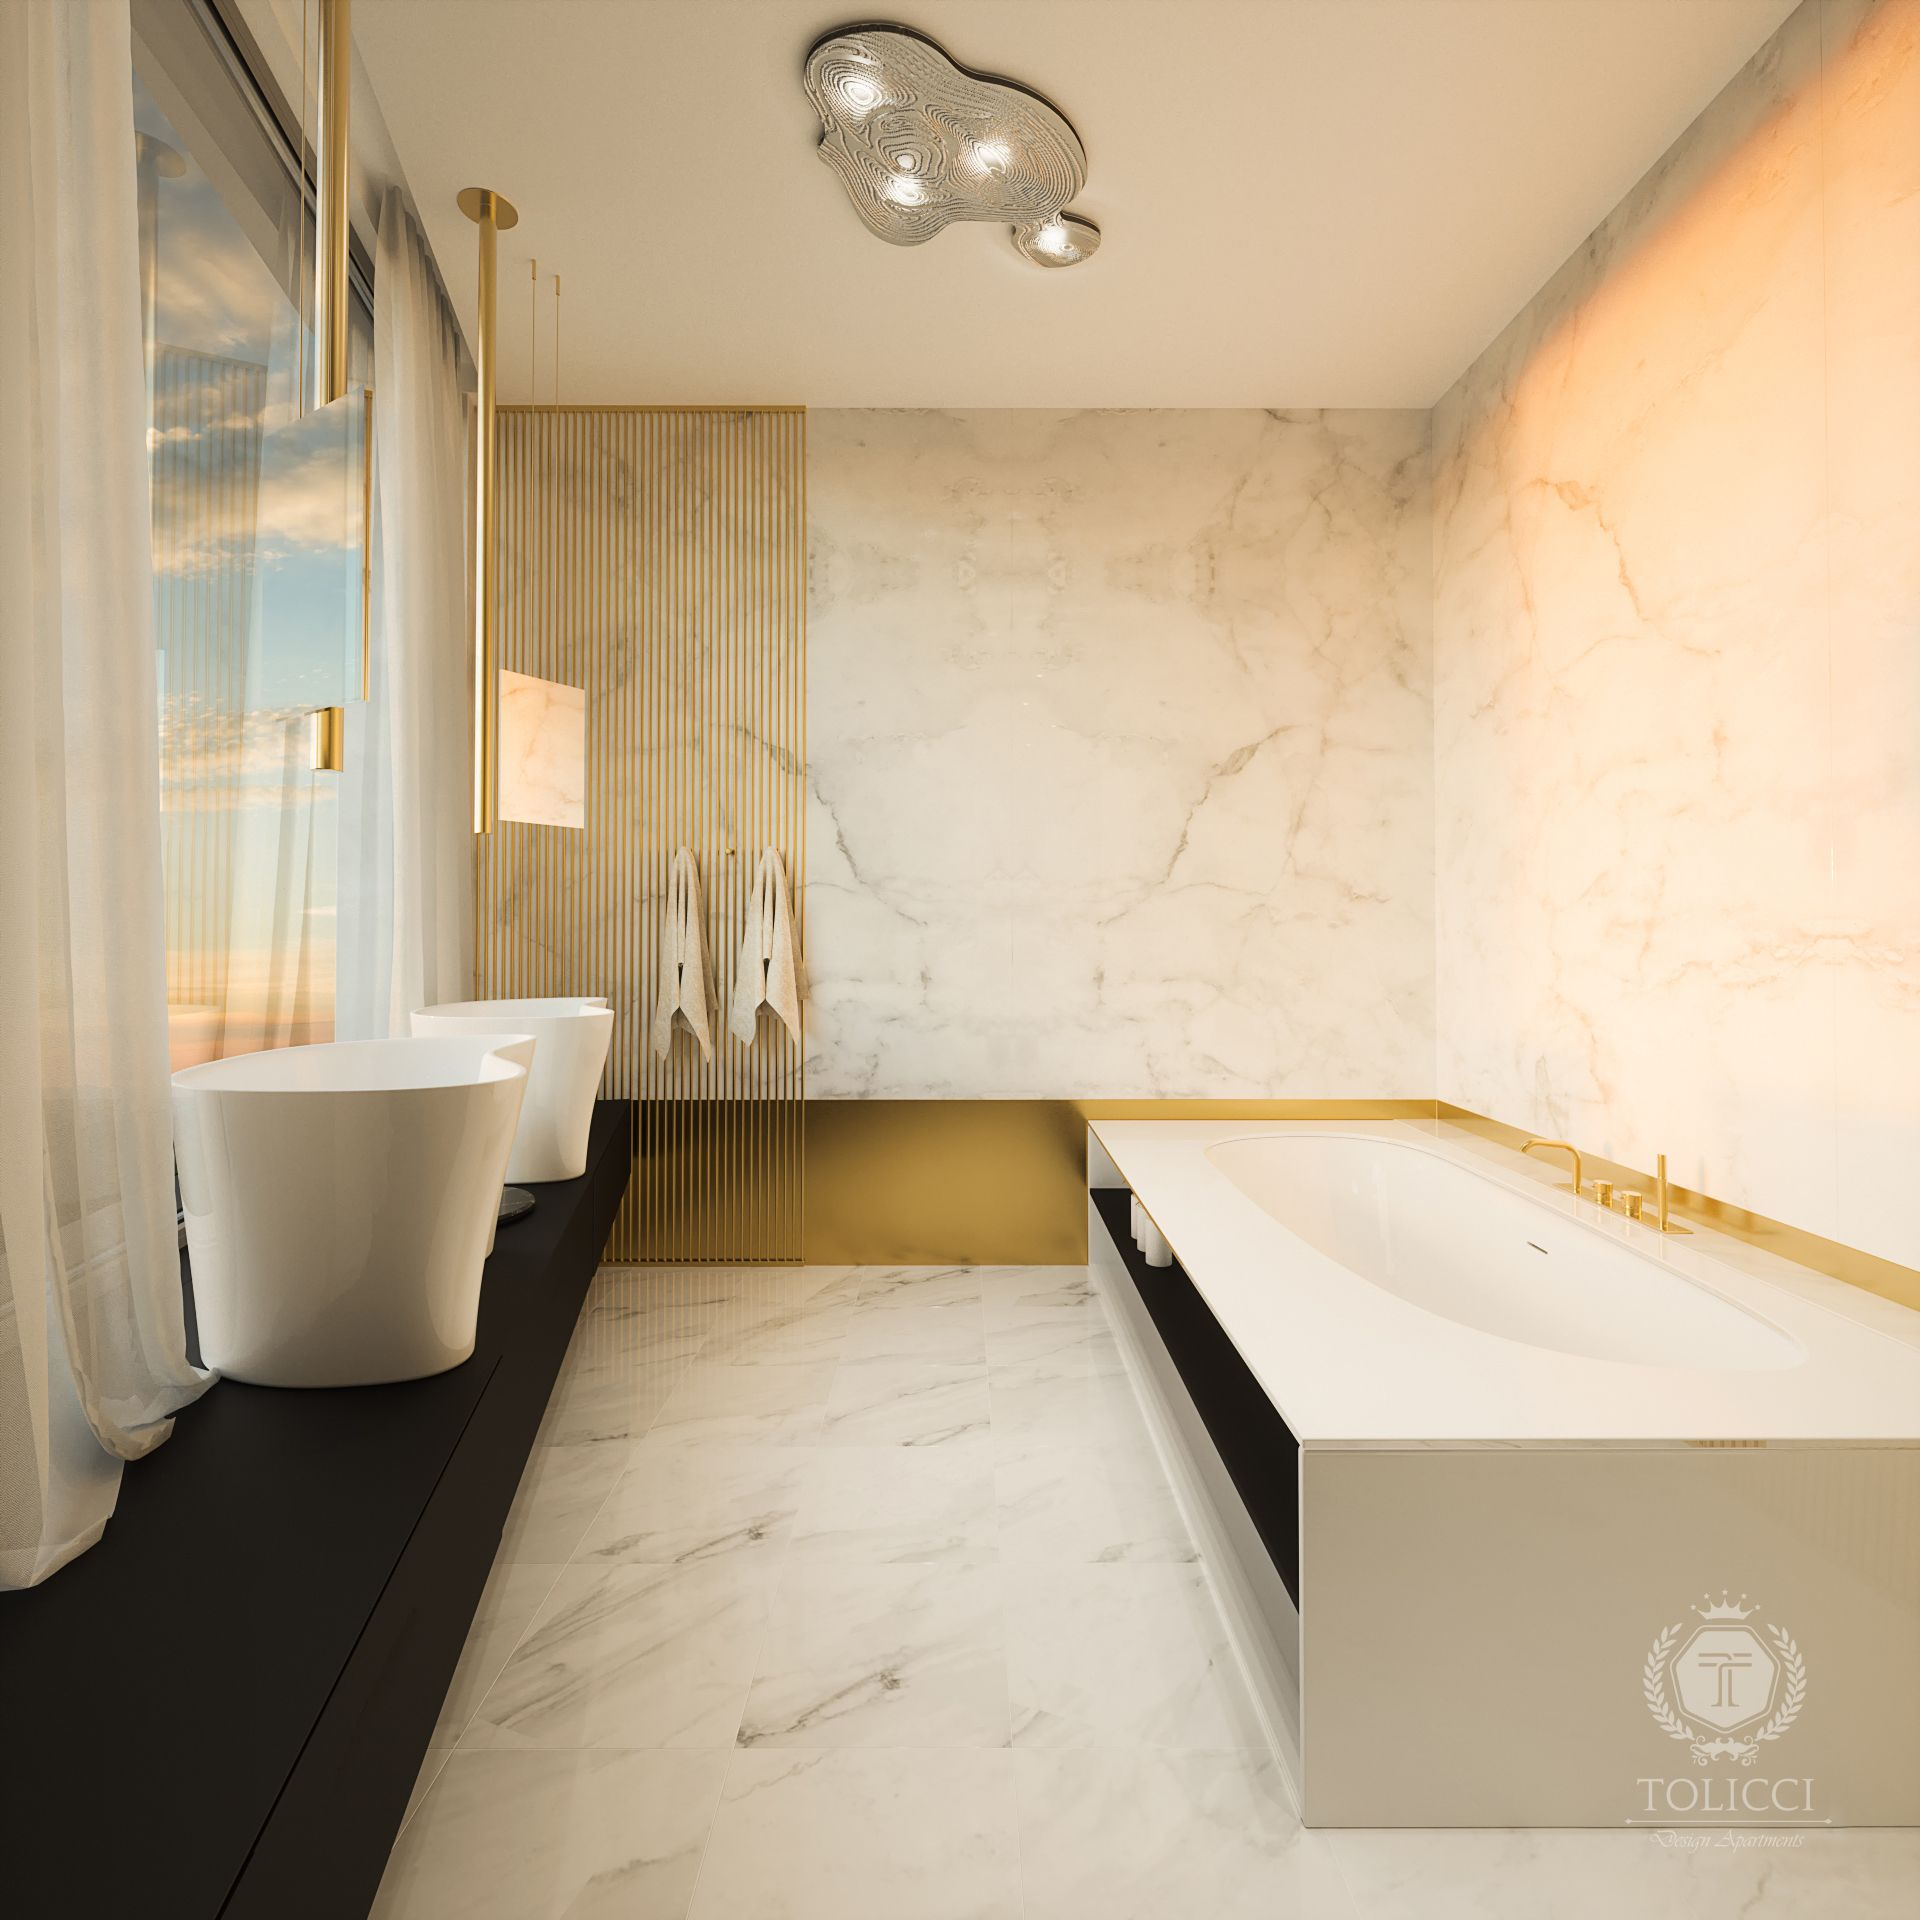 Tolicci Design Apartments Luxury Modern Bathroom Italian Design Interior Design Luxusna Mode Italian Bathroom Design Bathroom Design Color Bathroom Design